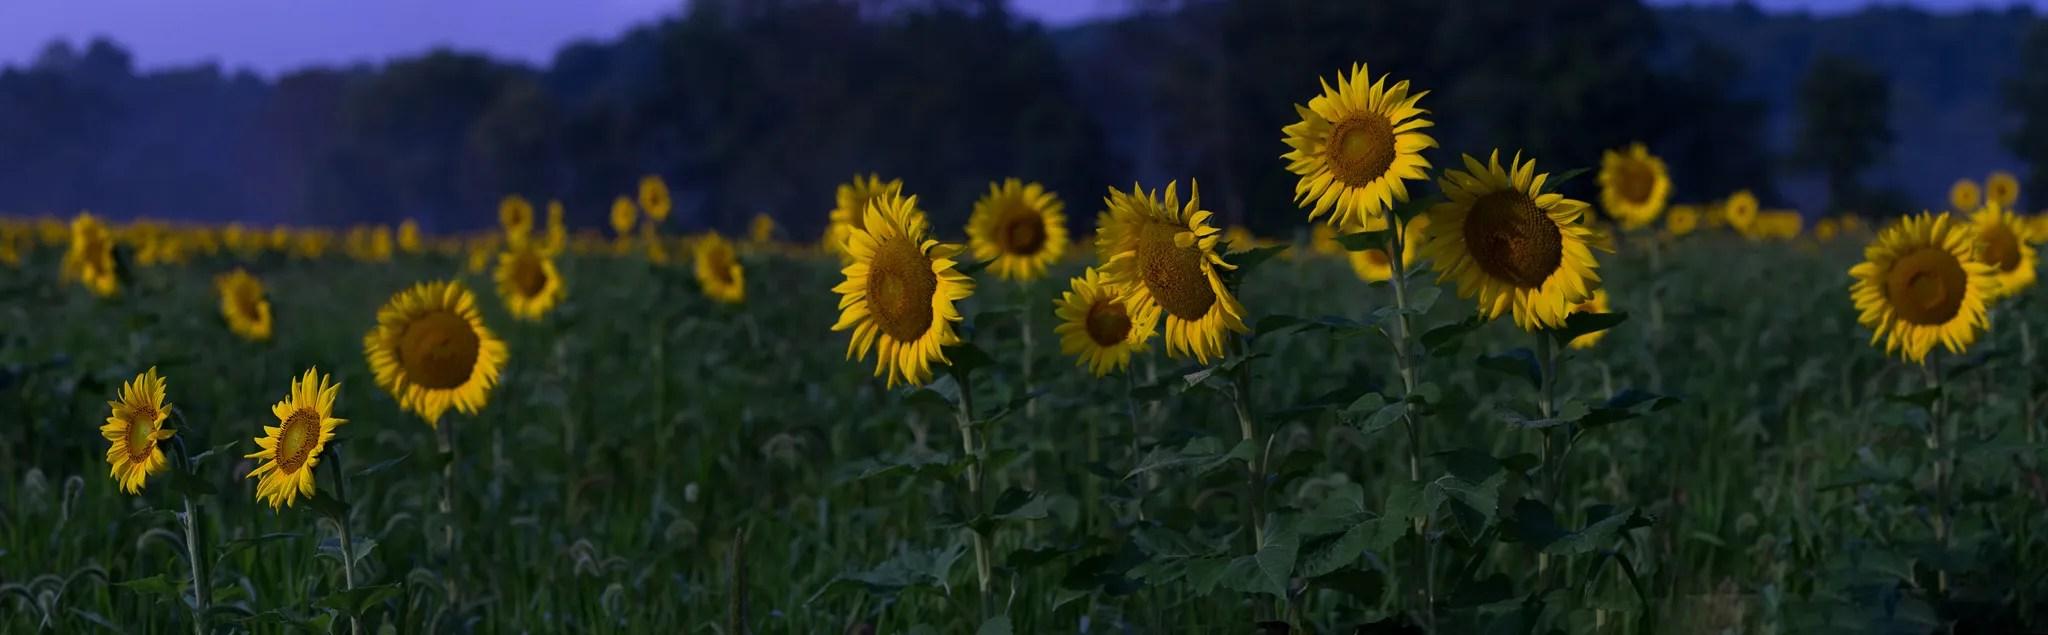 Sussex-sunflowers-2015-228-Pano-PSedit-PSedit